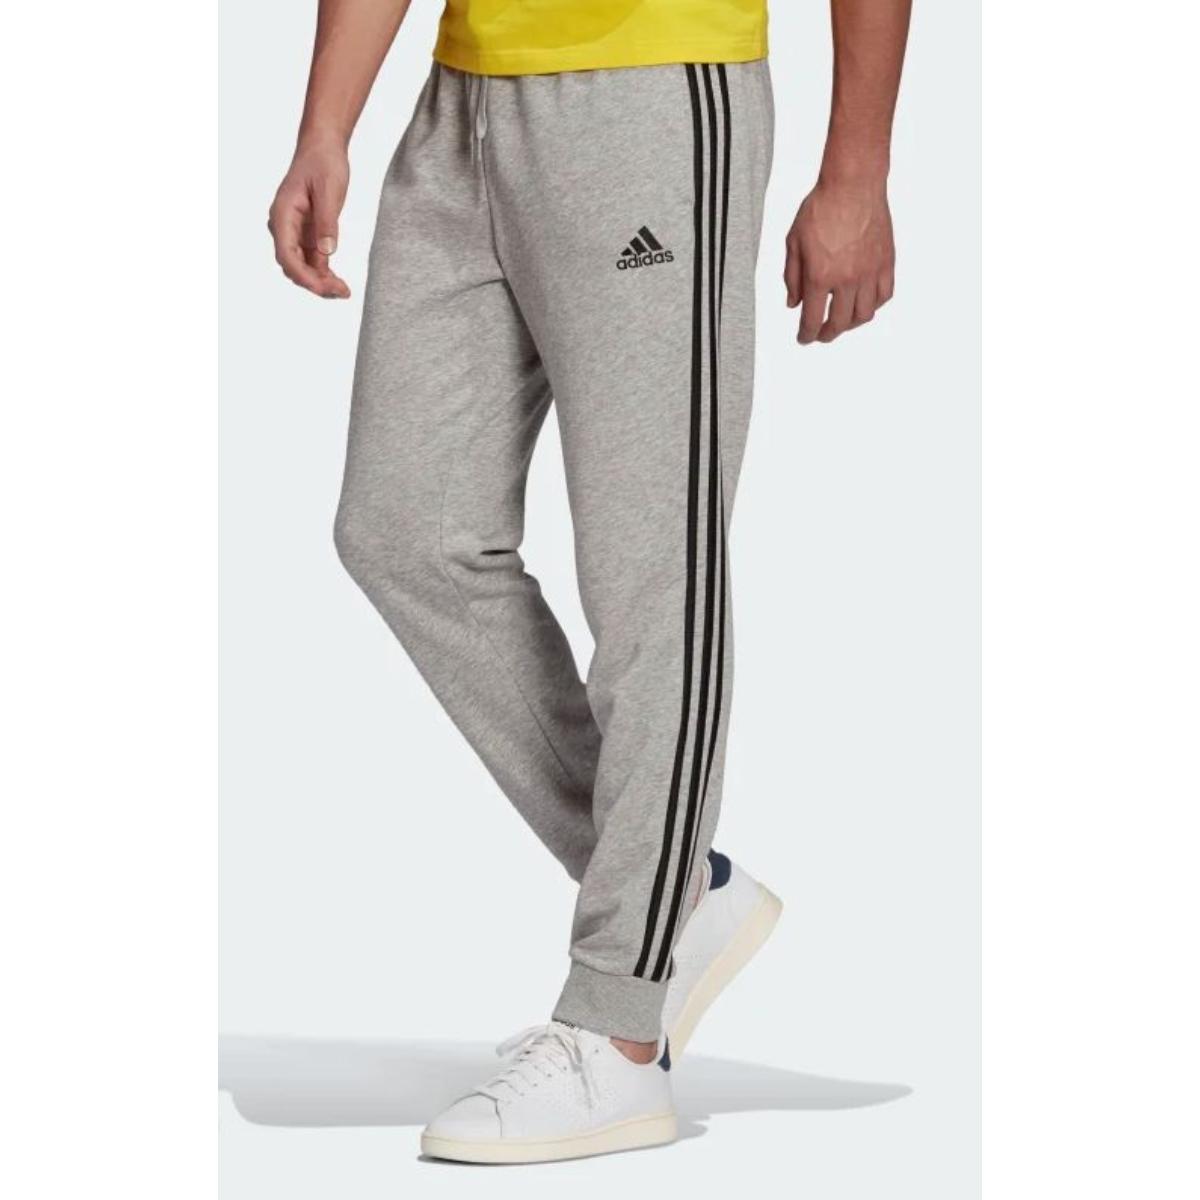 Calça Masculina Adidas Gk8889 m 3s ft Mescla